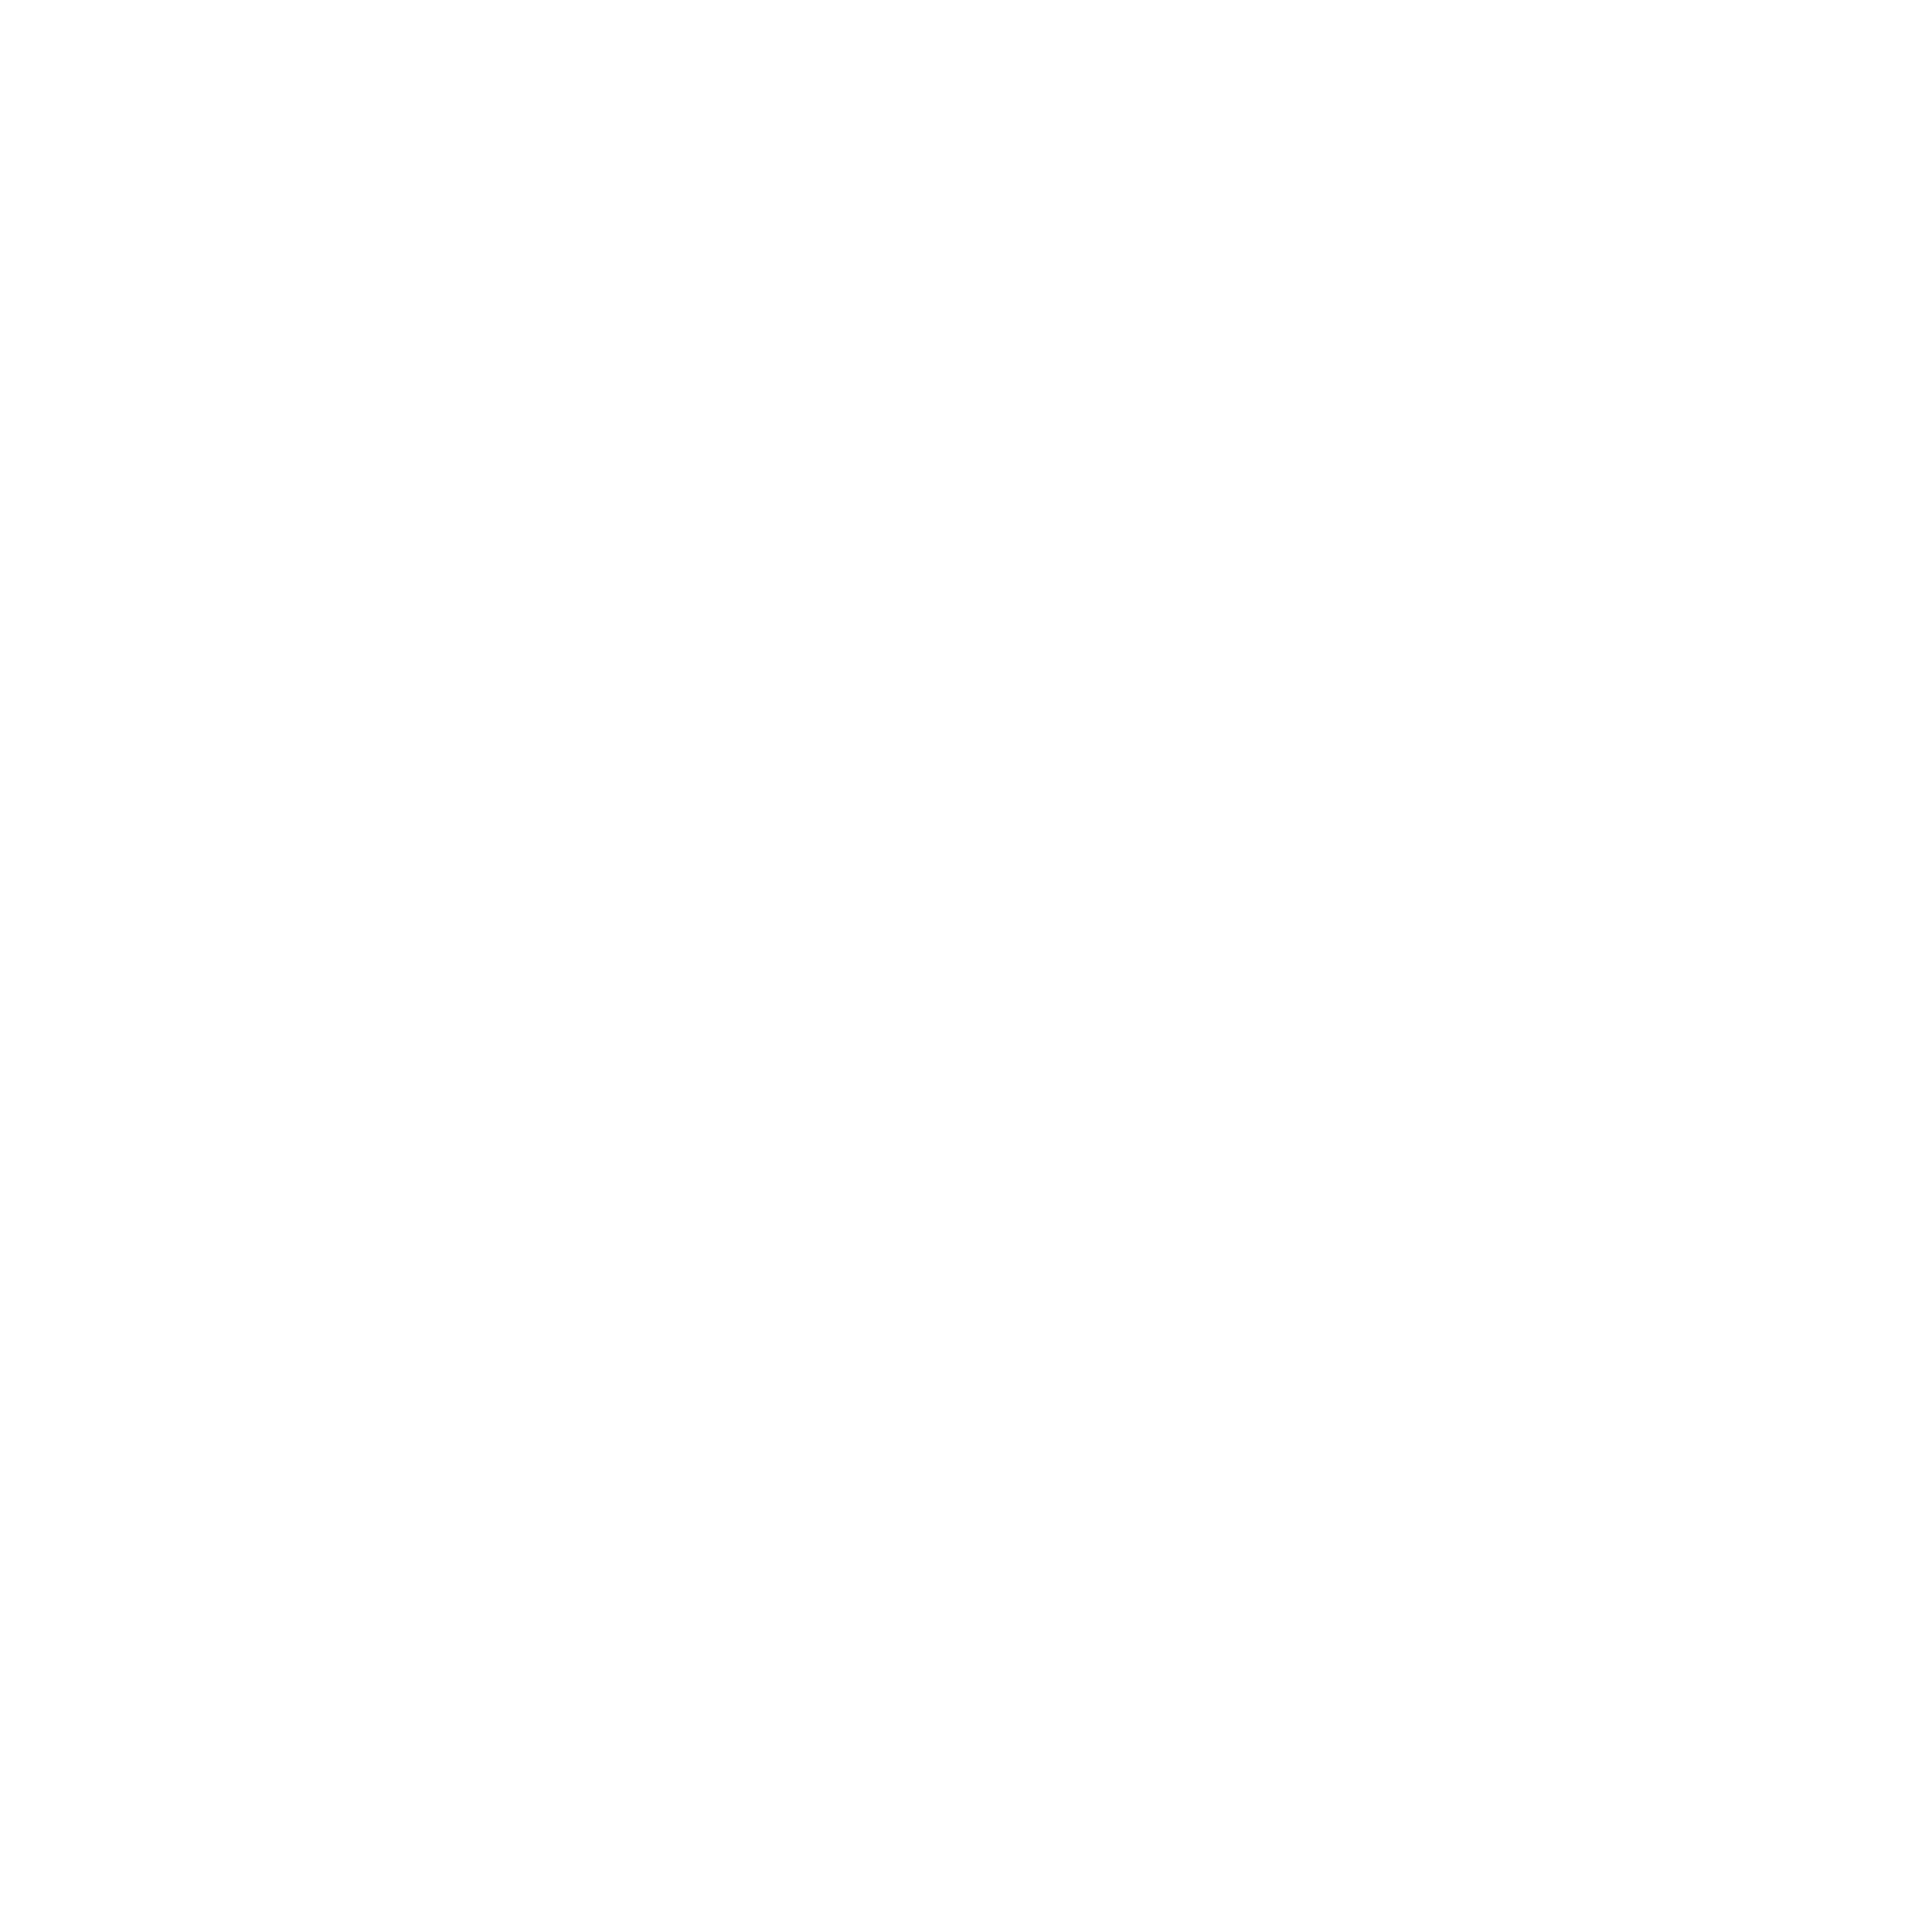 Logo Kona blanc